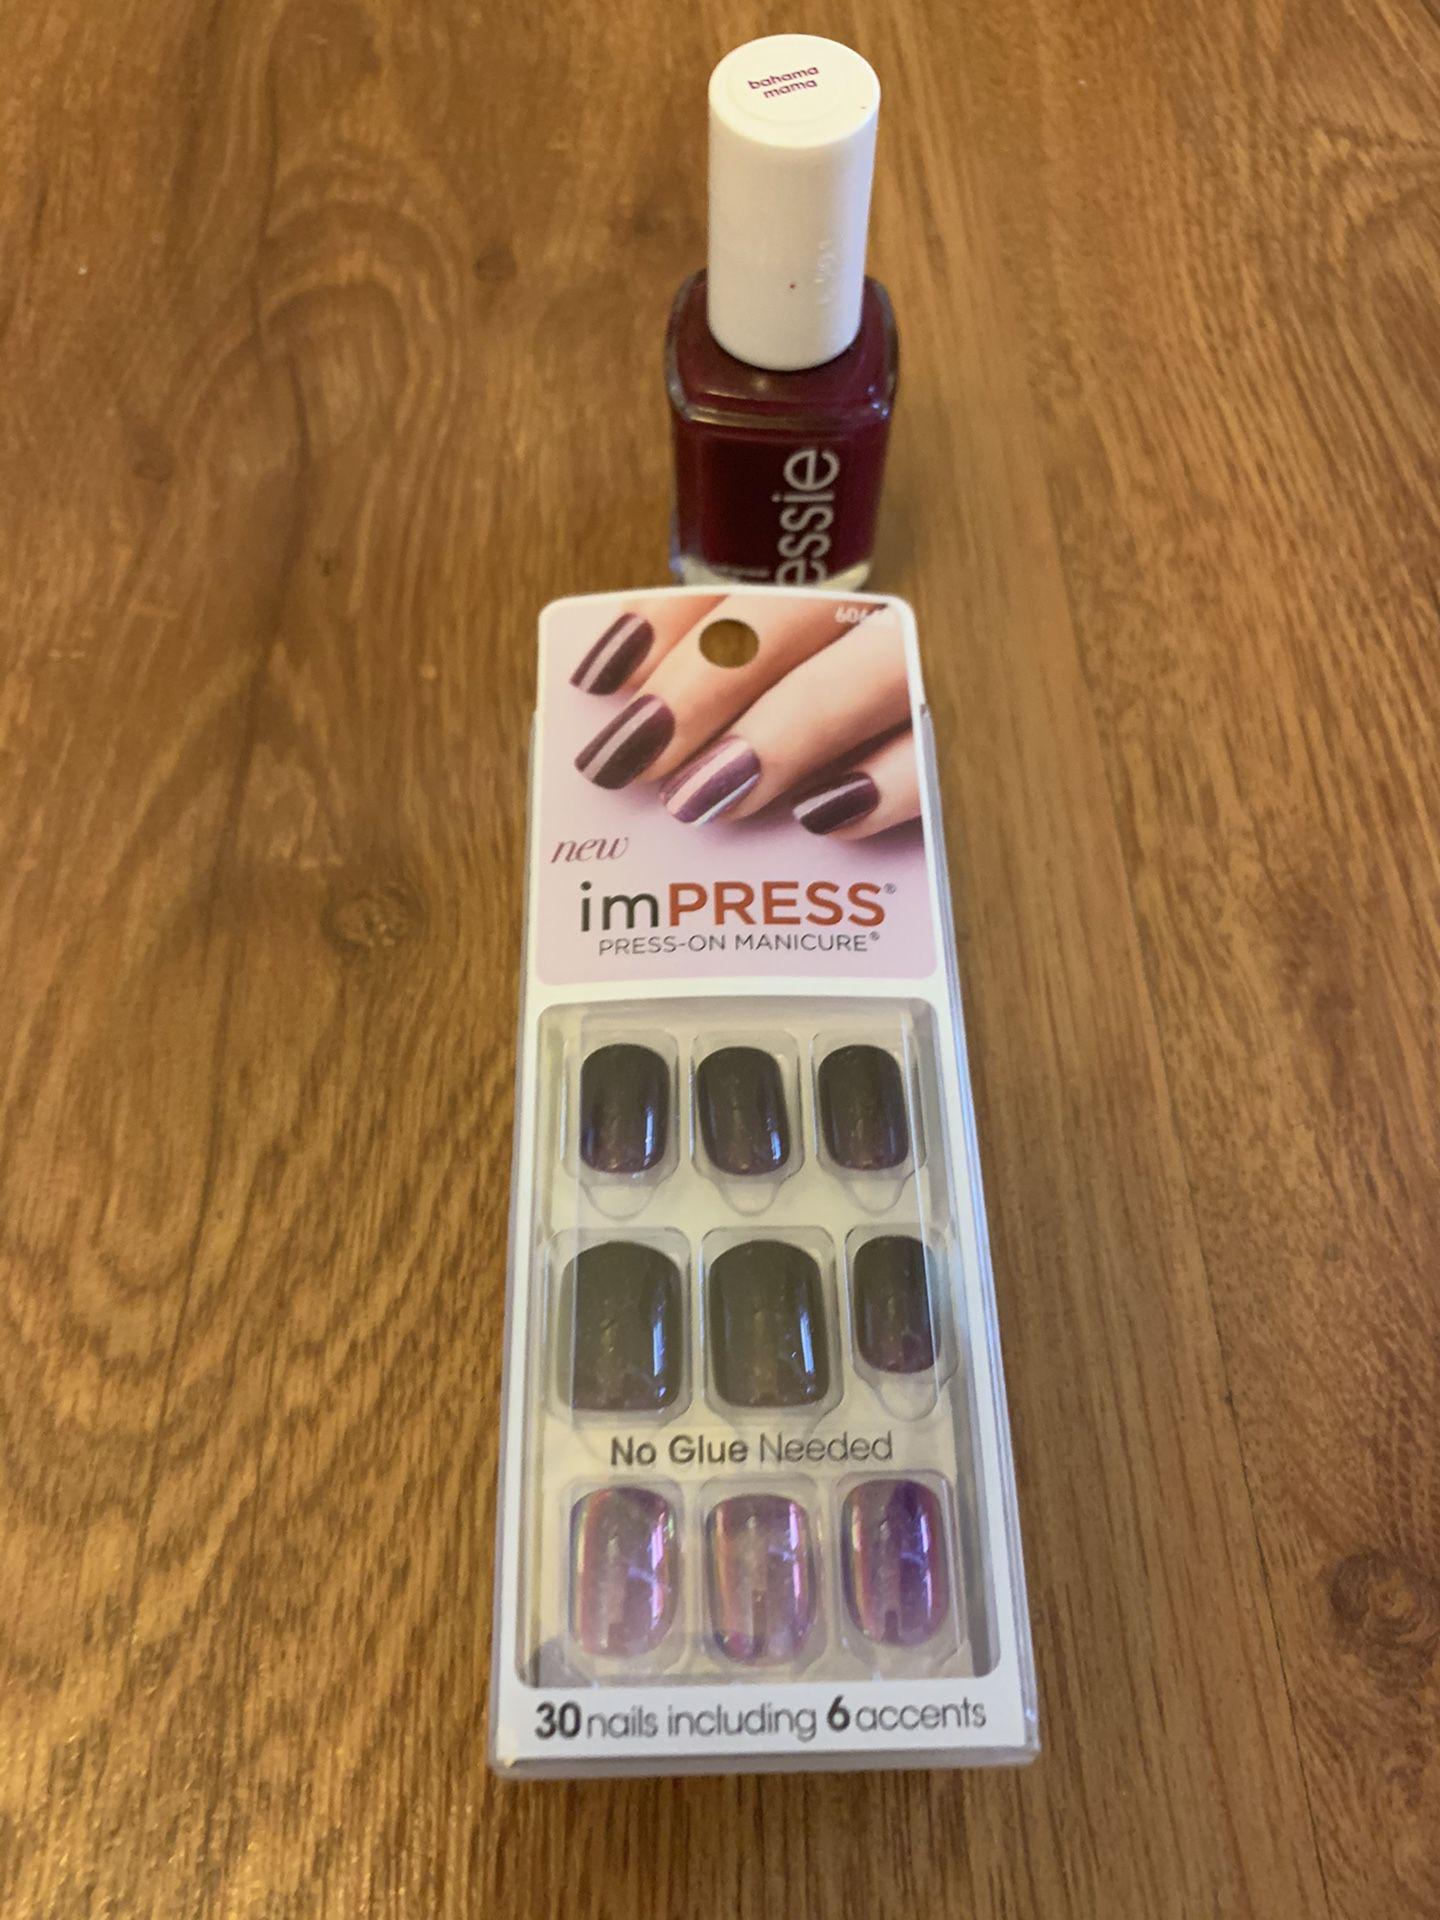 Brand ImPRESS nails & essie lacquer